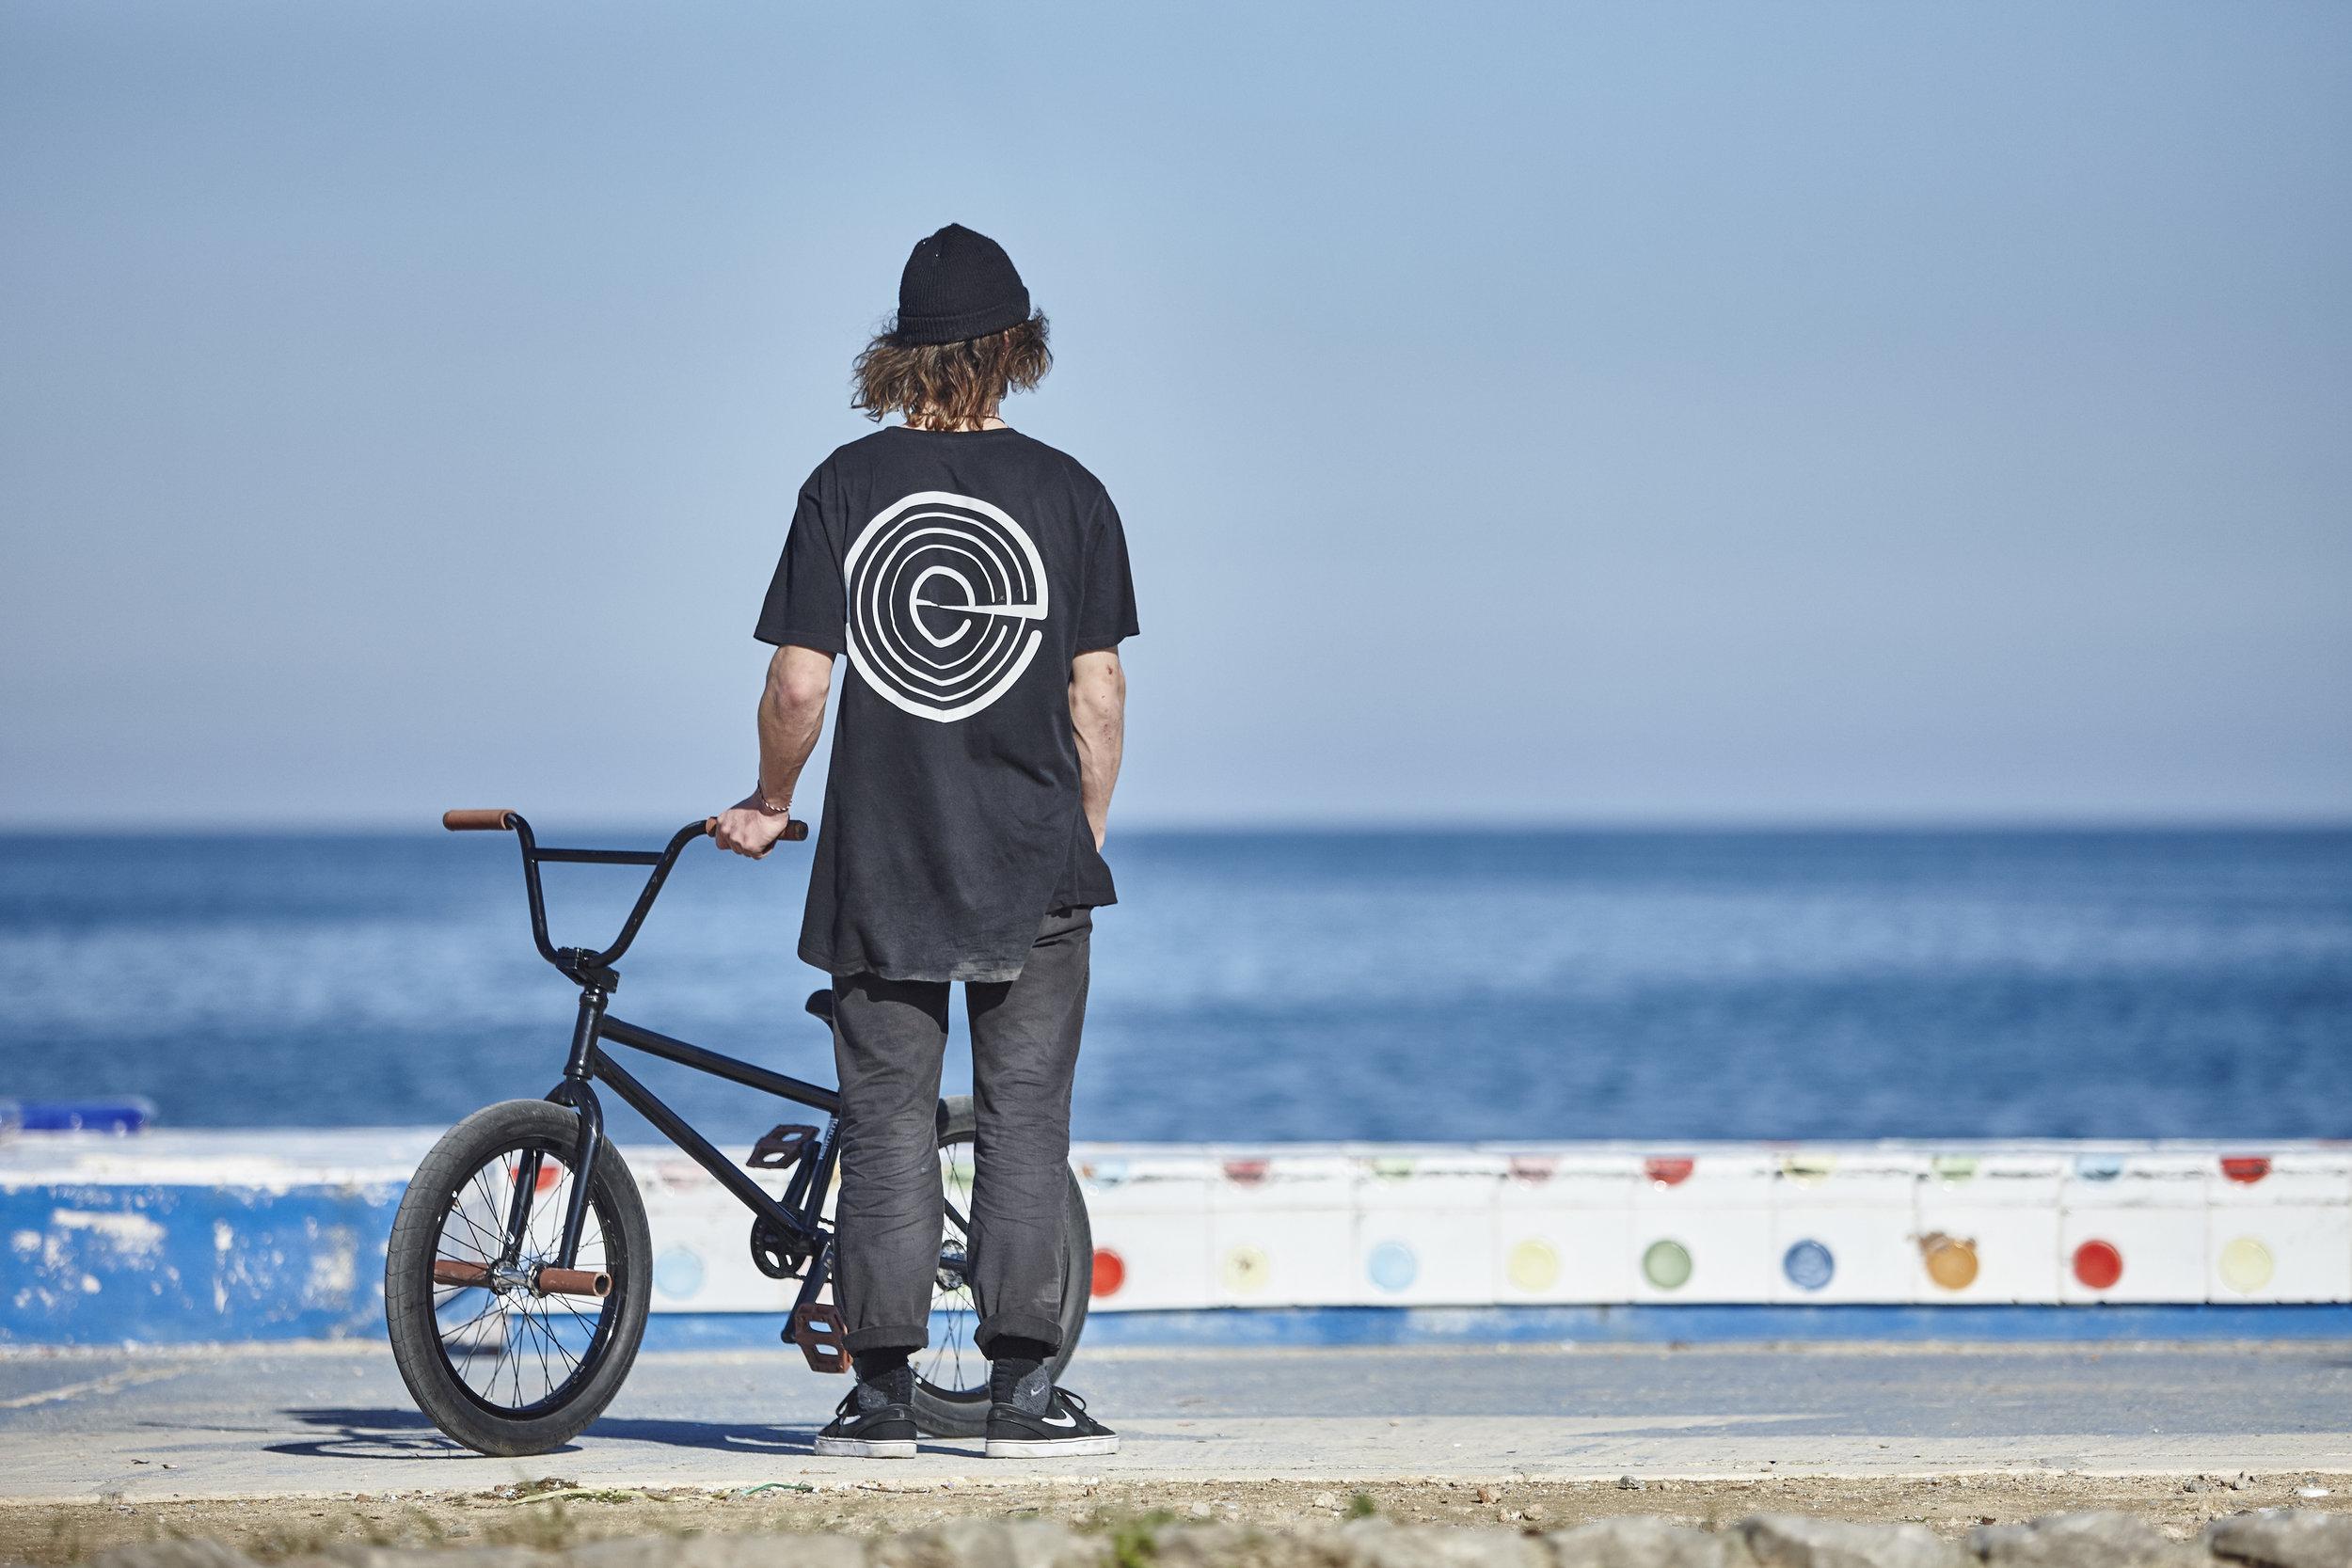 Jordan stood with bike RGB.jpg